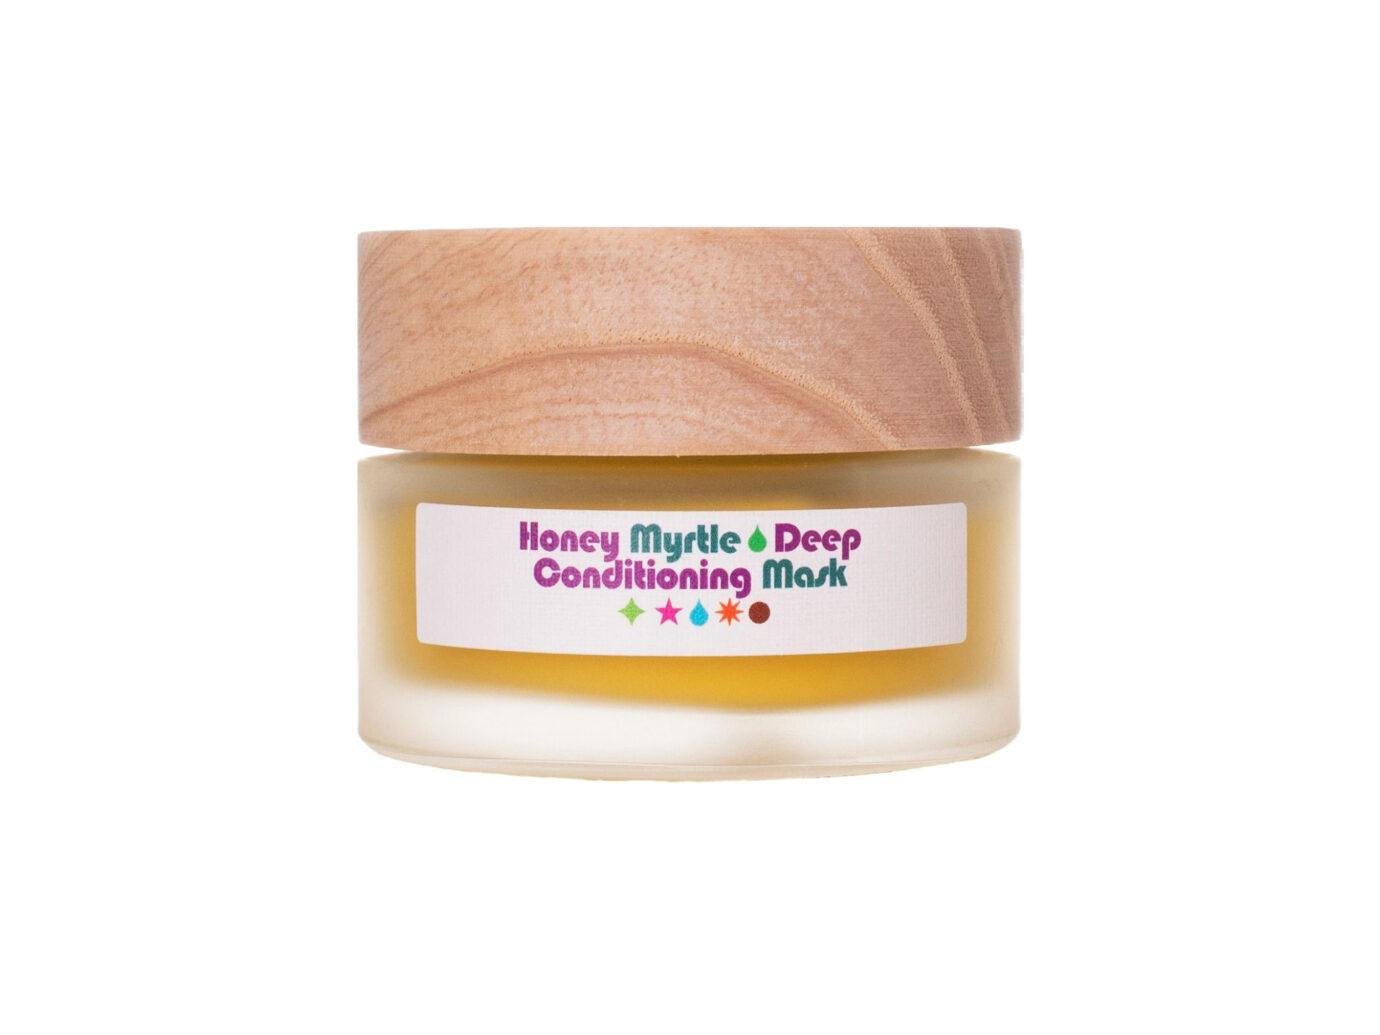 Living Libations Honey Myrtle Deep Conditioning Mask